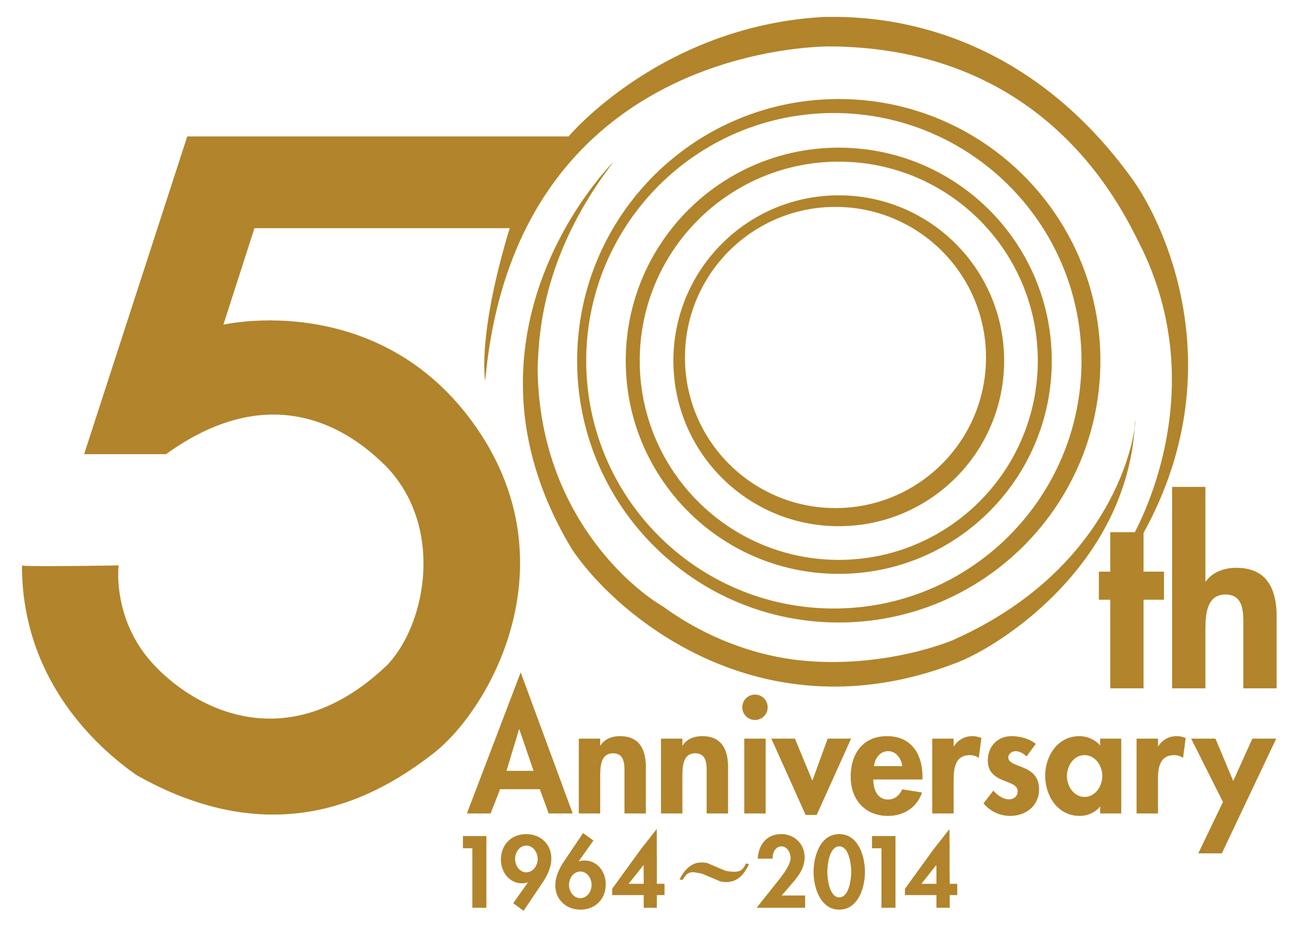 png hd 50th wedding anniversary transparent hd 50th